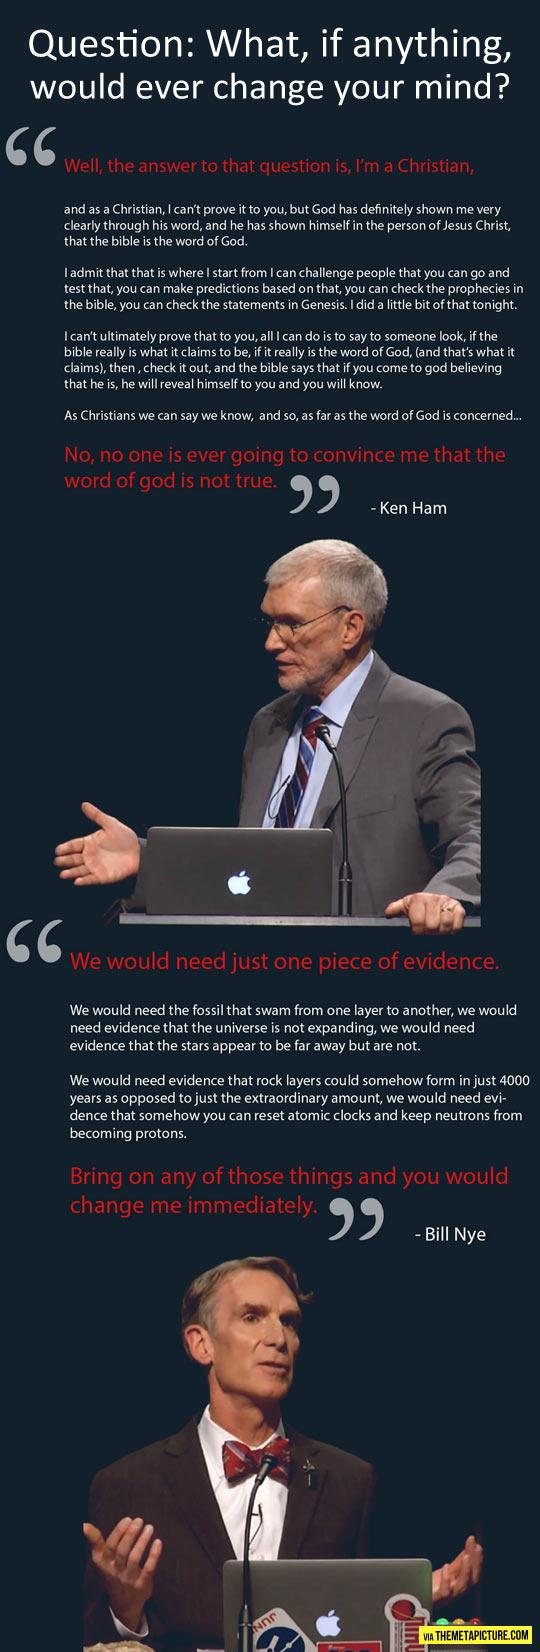 cool-Bill-Nye-Ken-Ham-debate-quotes